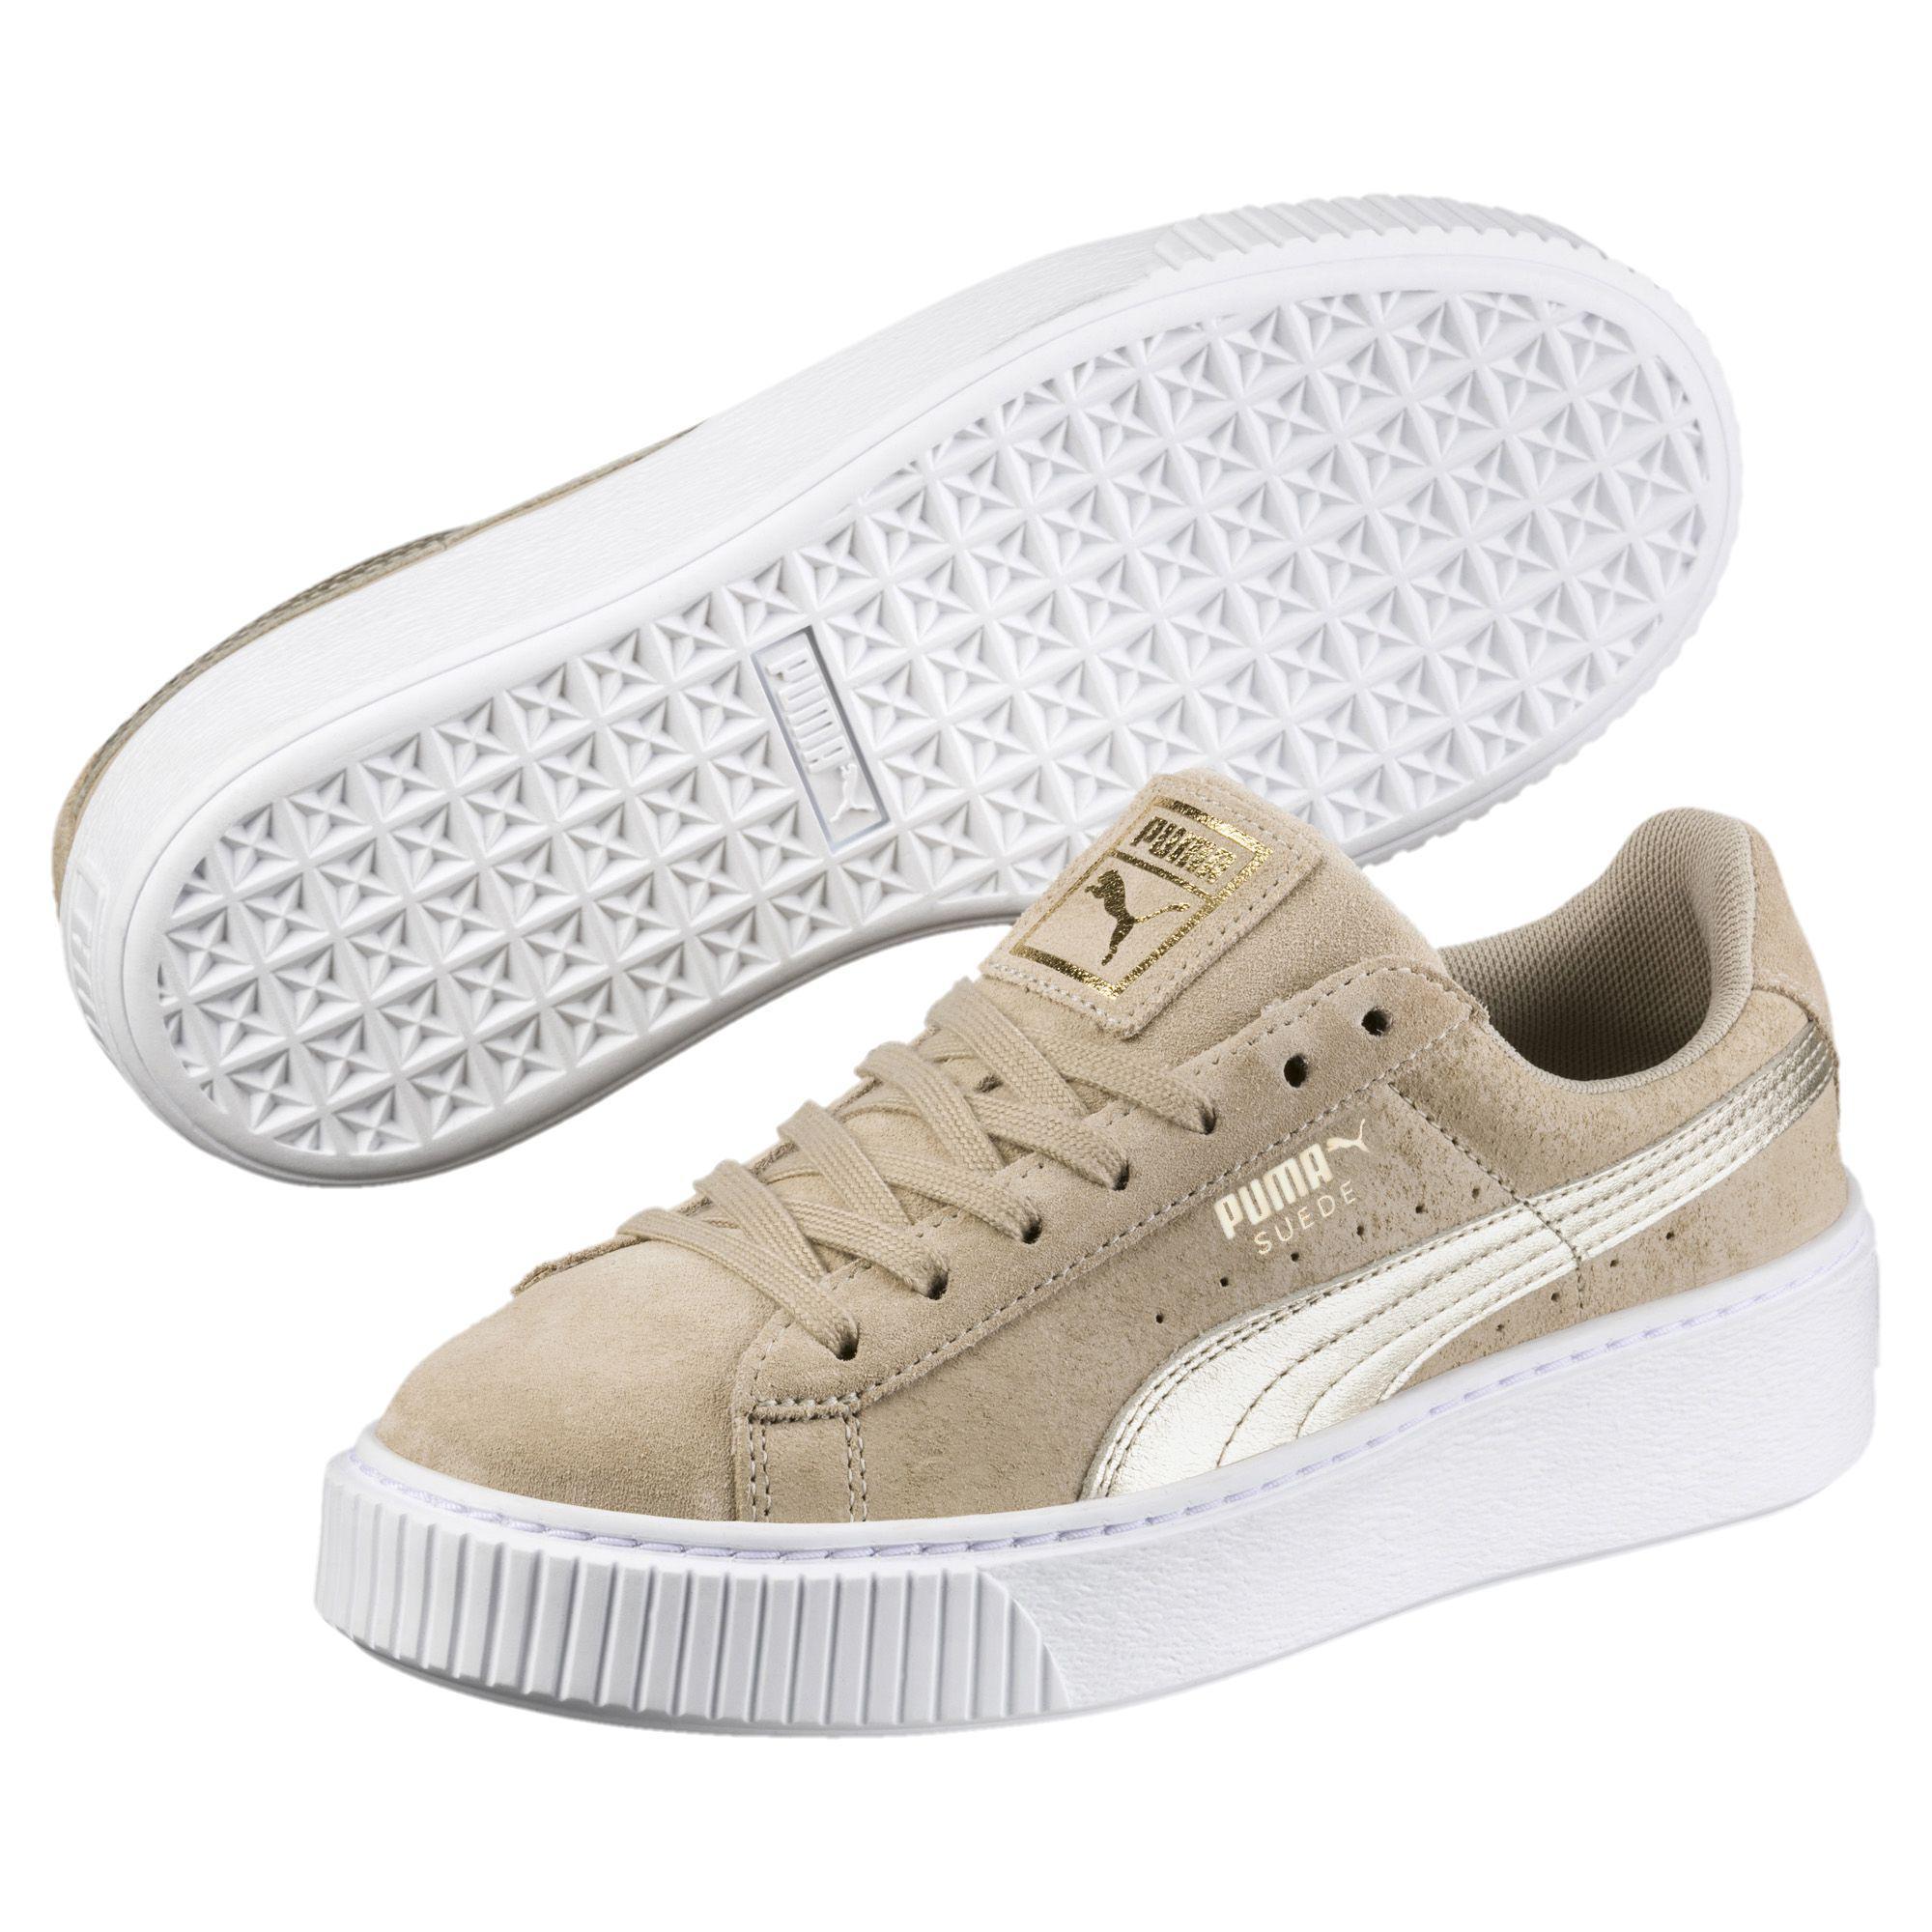 5d88f8af0d142 PUMA Multicolor Suede Platform Metallic Safari Women's Sneakers